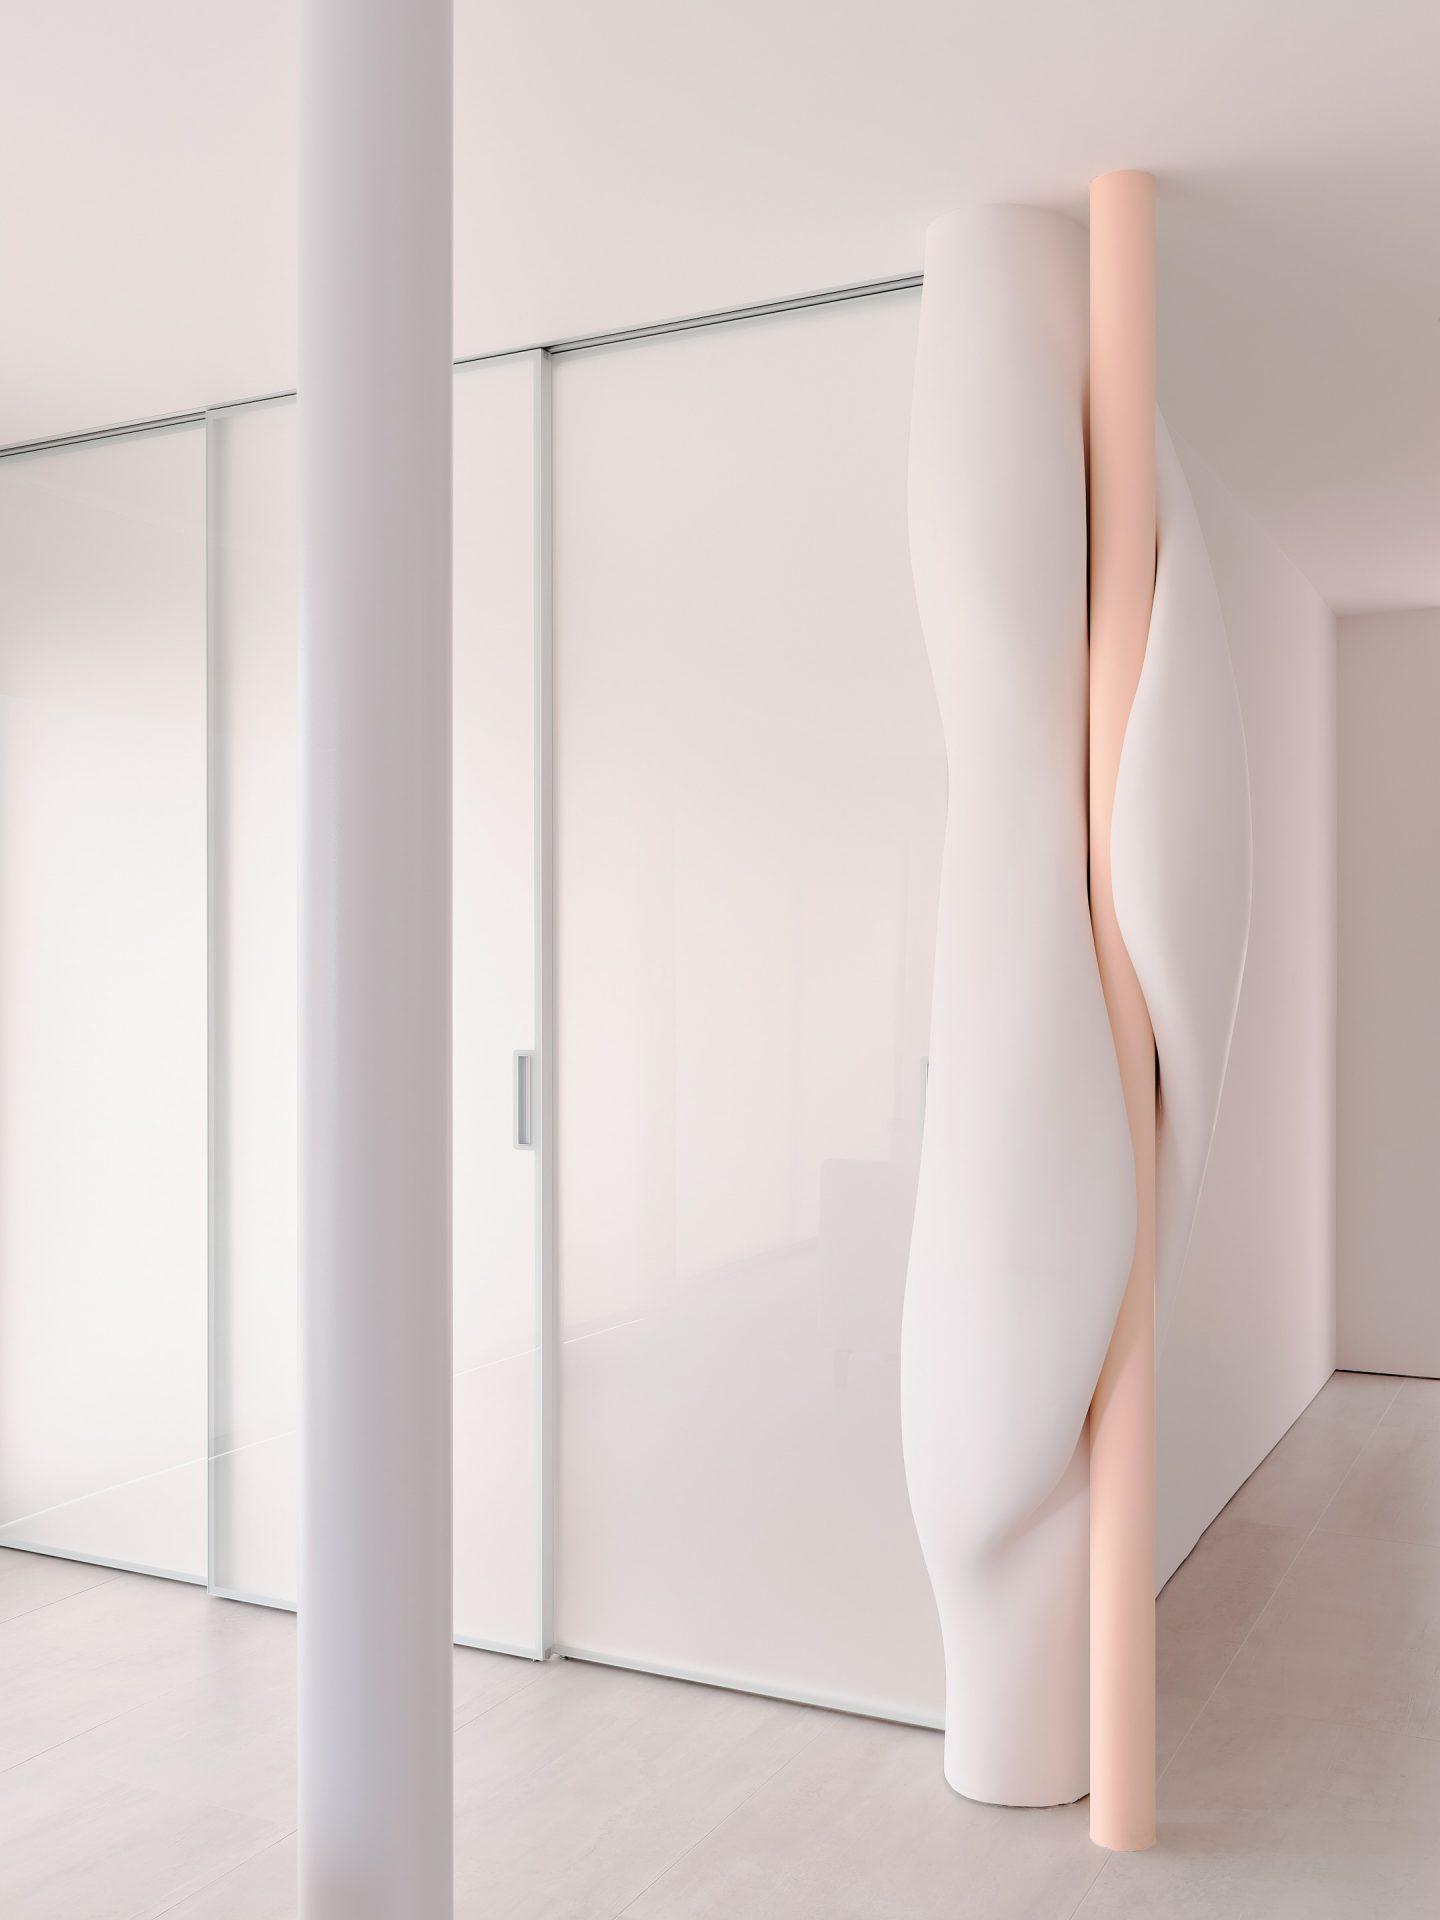 IGNANT-Architecture-Opa-Softie-09